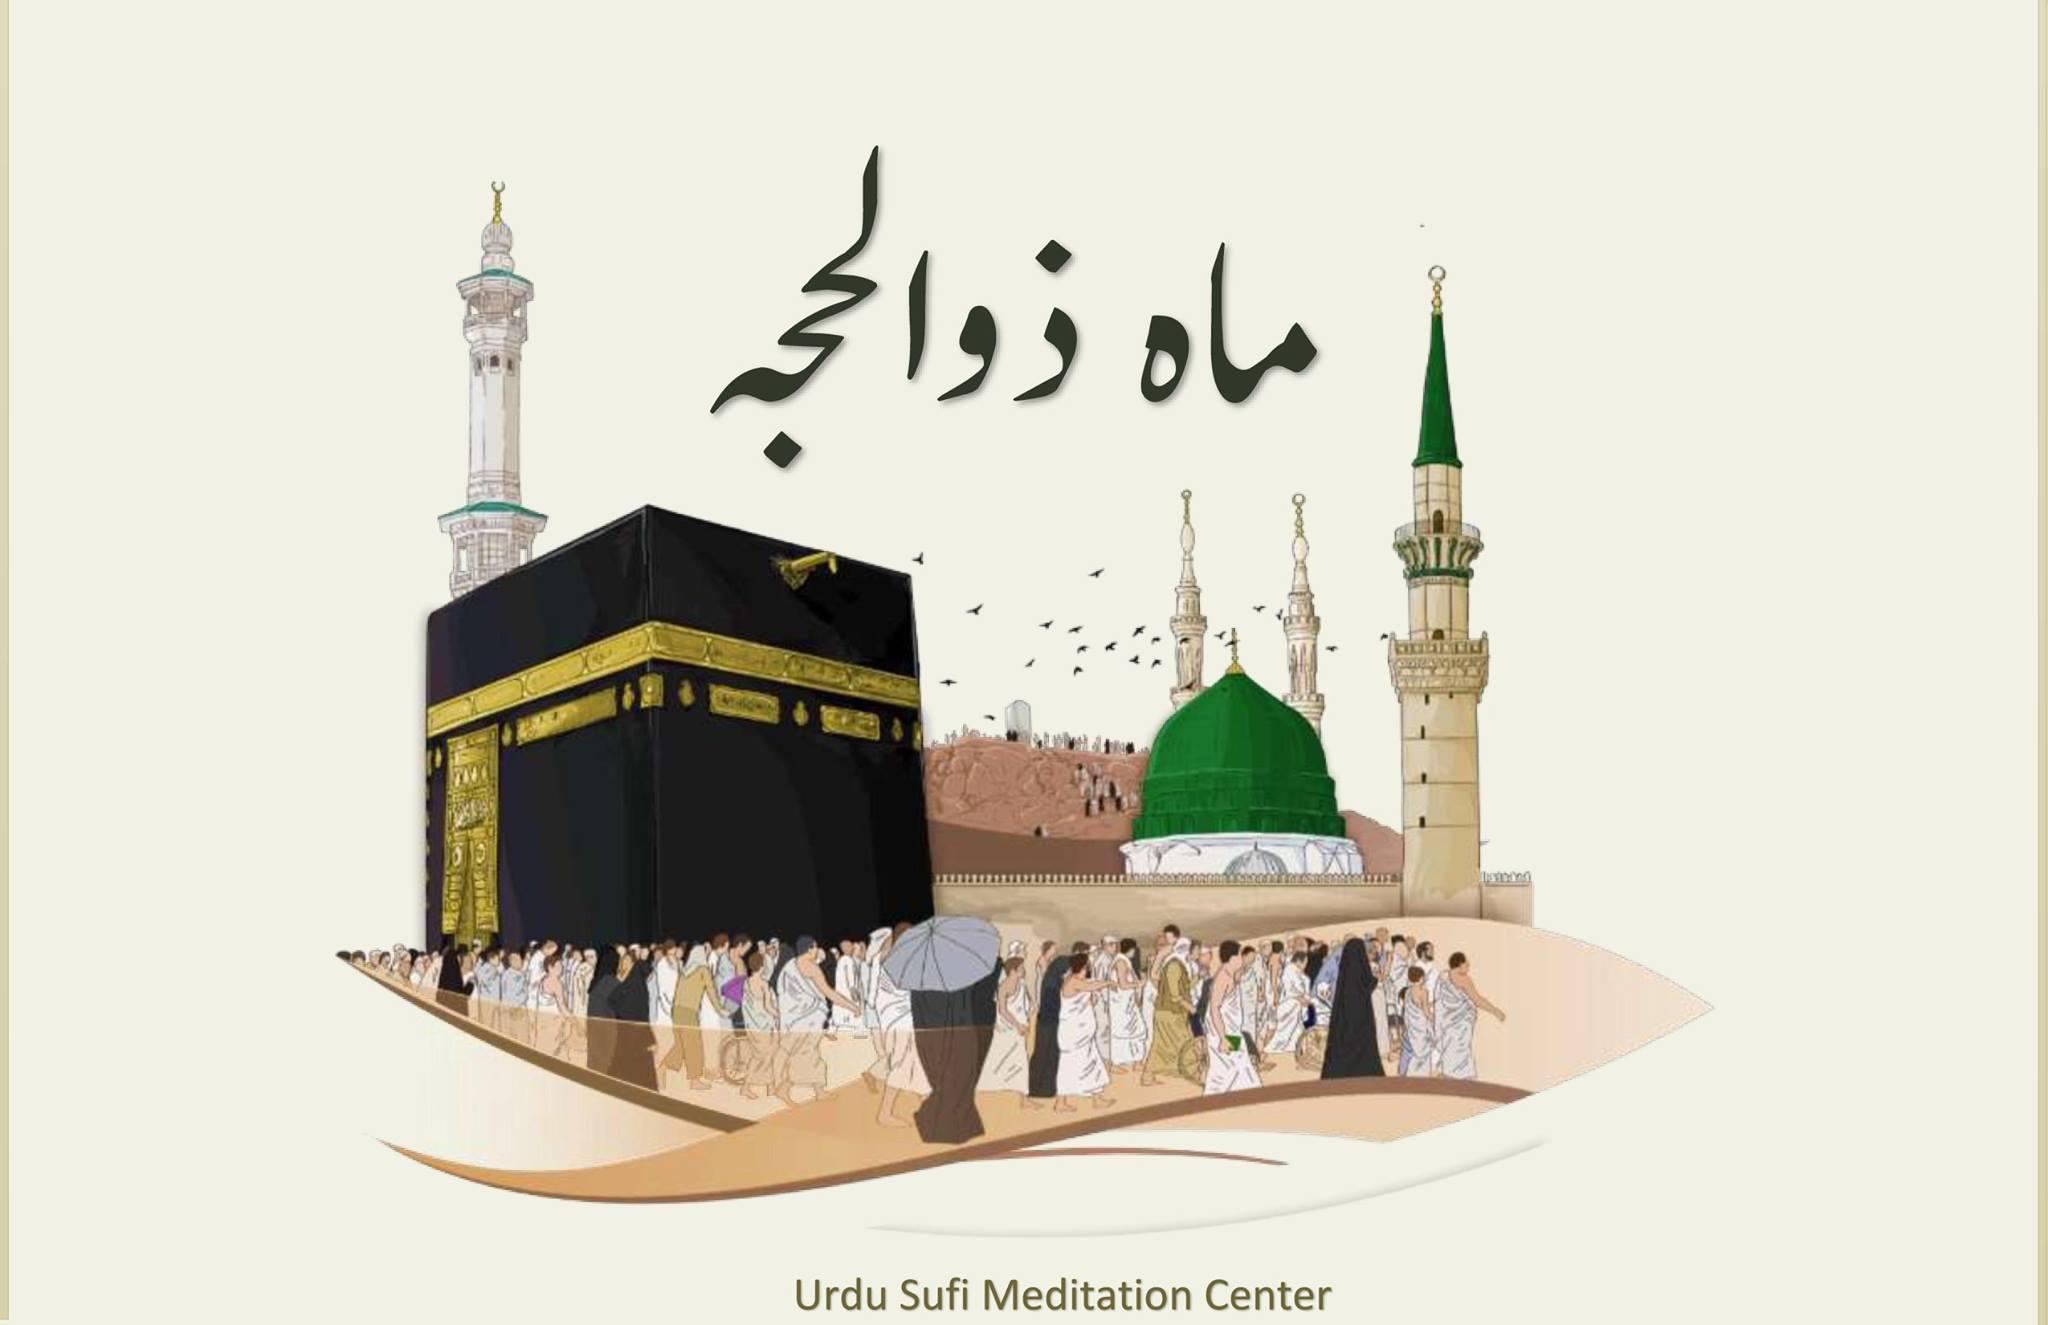 |Welcoming the Holy Month of Dhul Hijjah| ماہِ ذُوالْحِجَّه یا ذُوالْحَجَّه |ب...